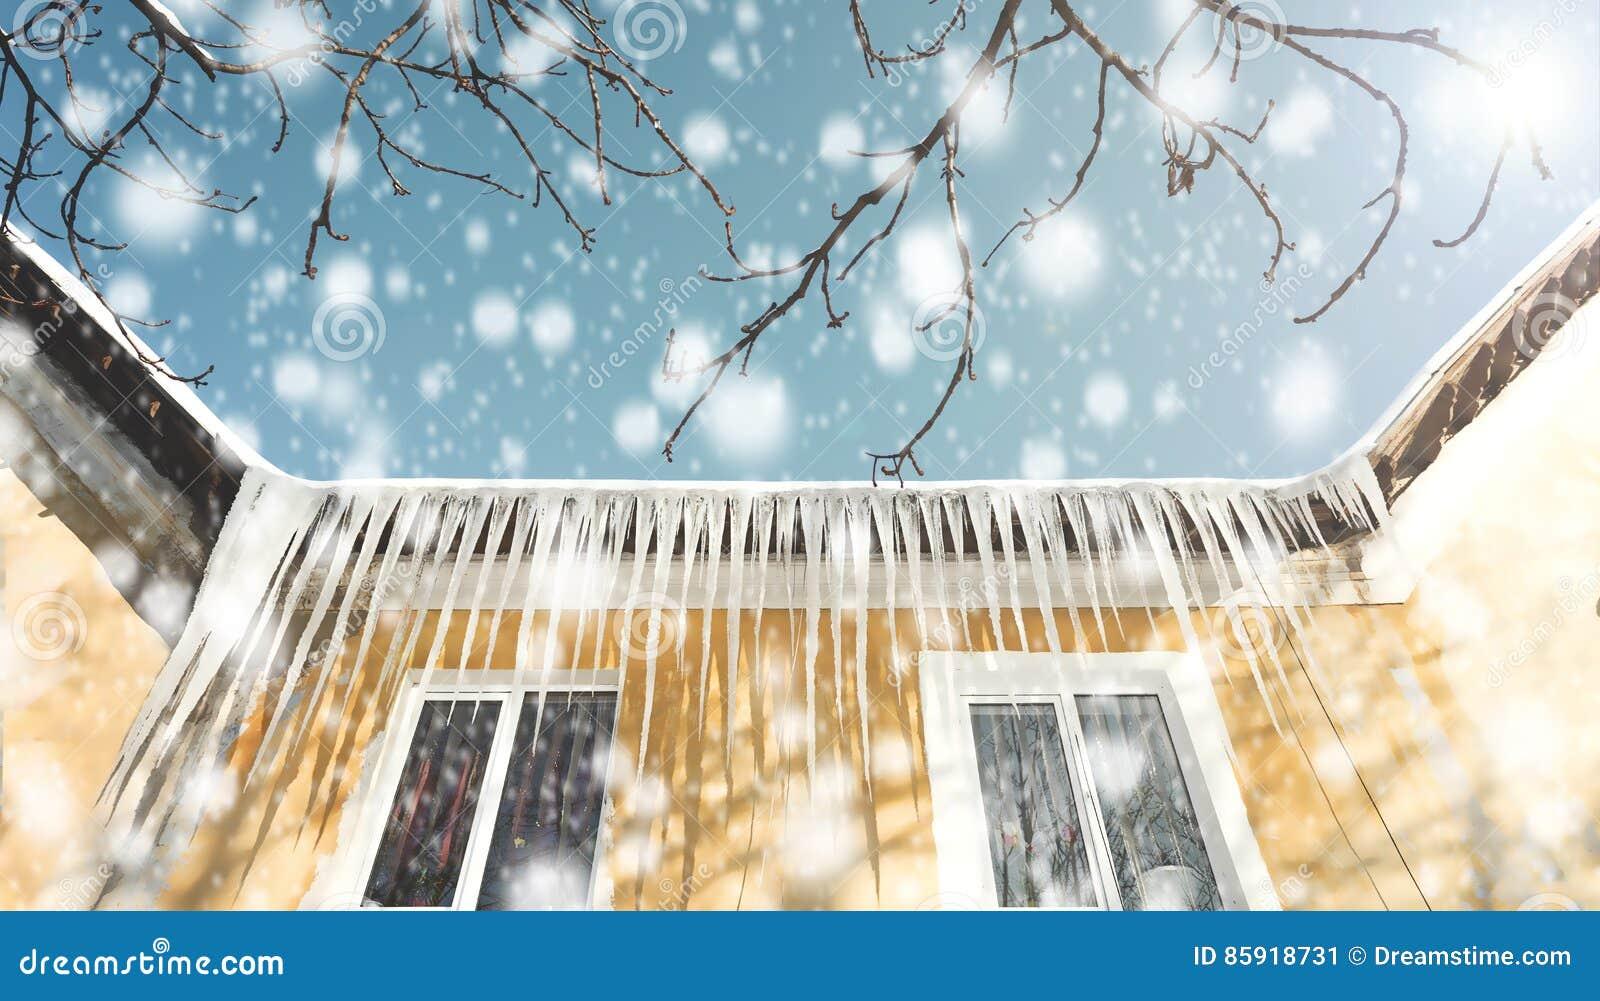 Represas do gelo, sincelos no telhado